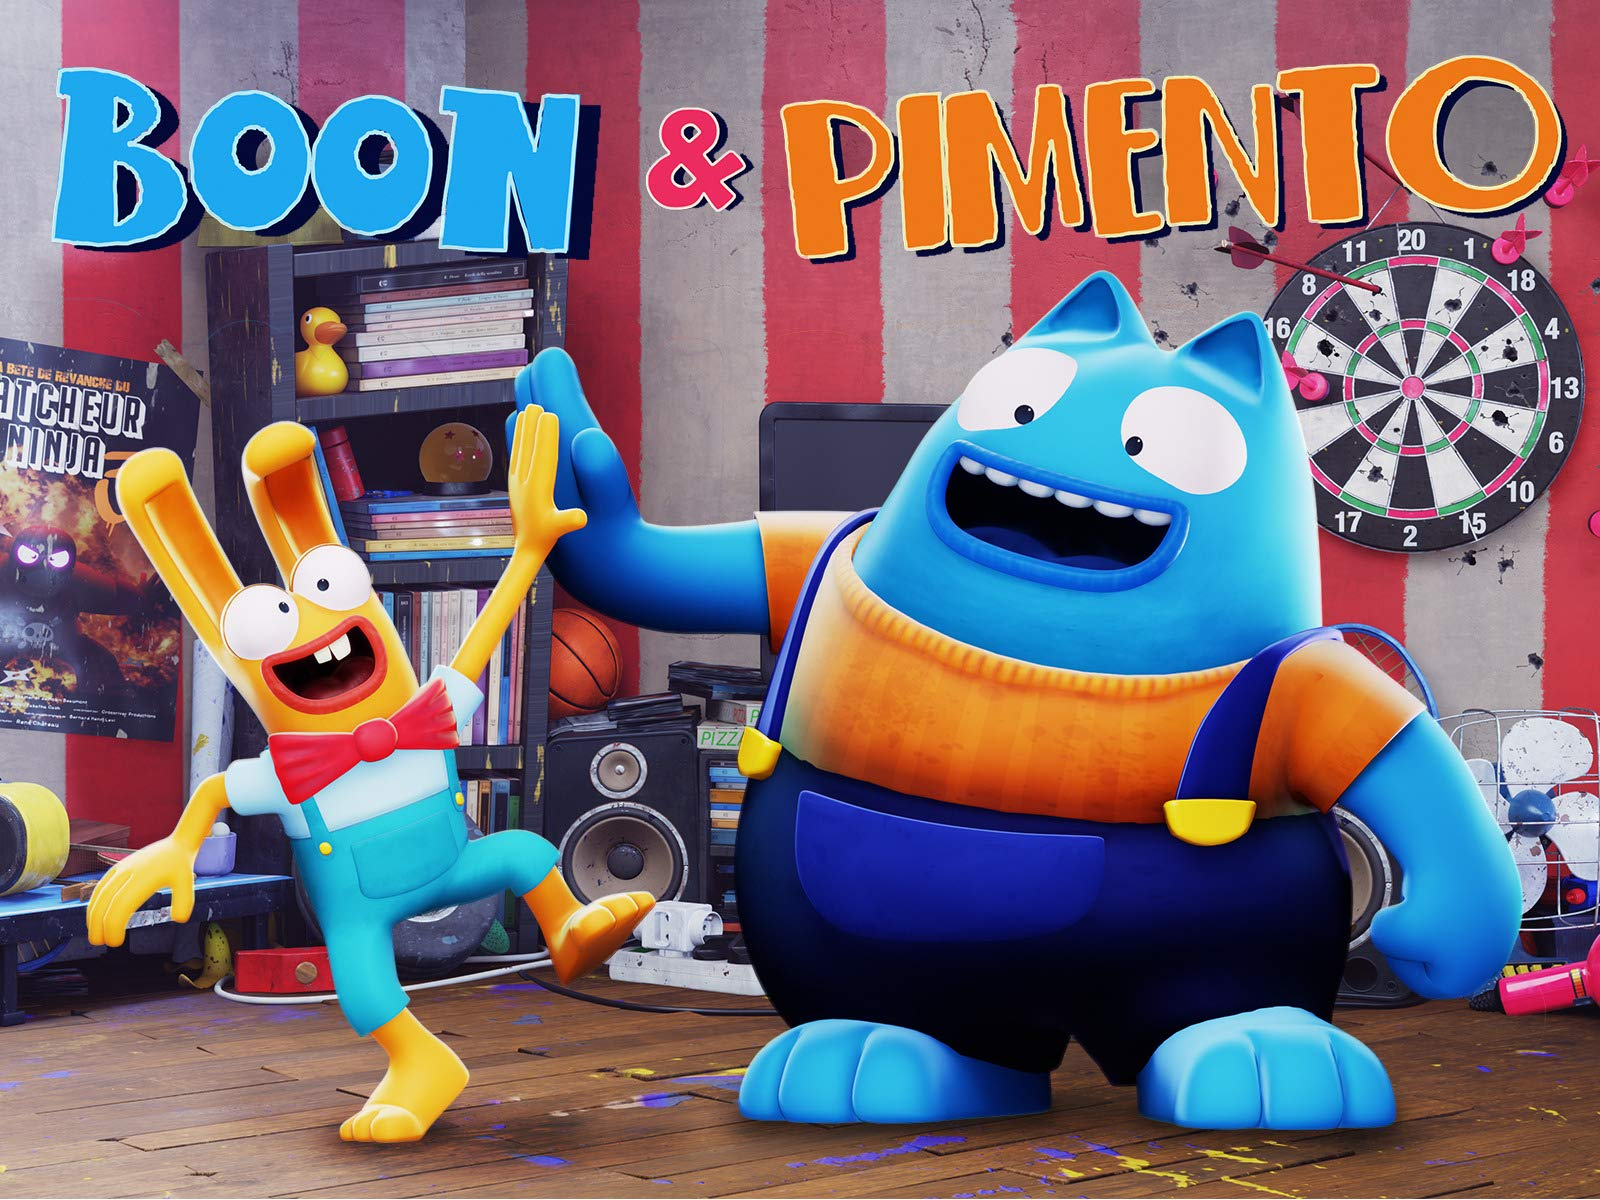 Boon & Pimento